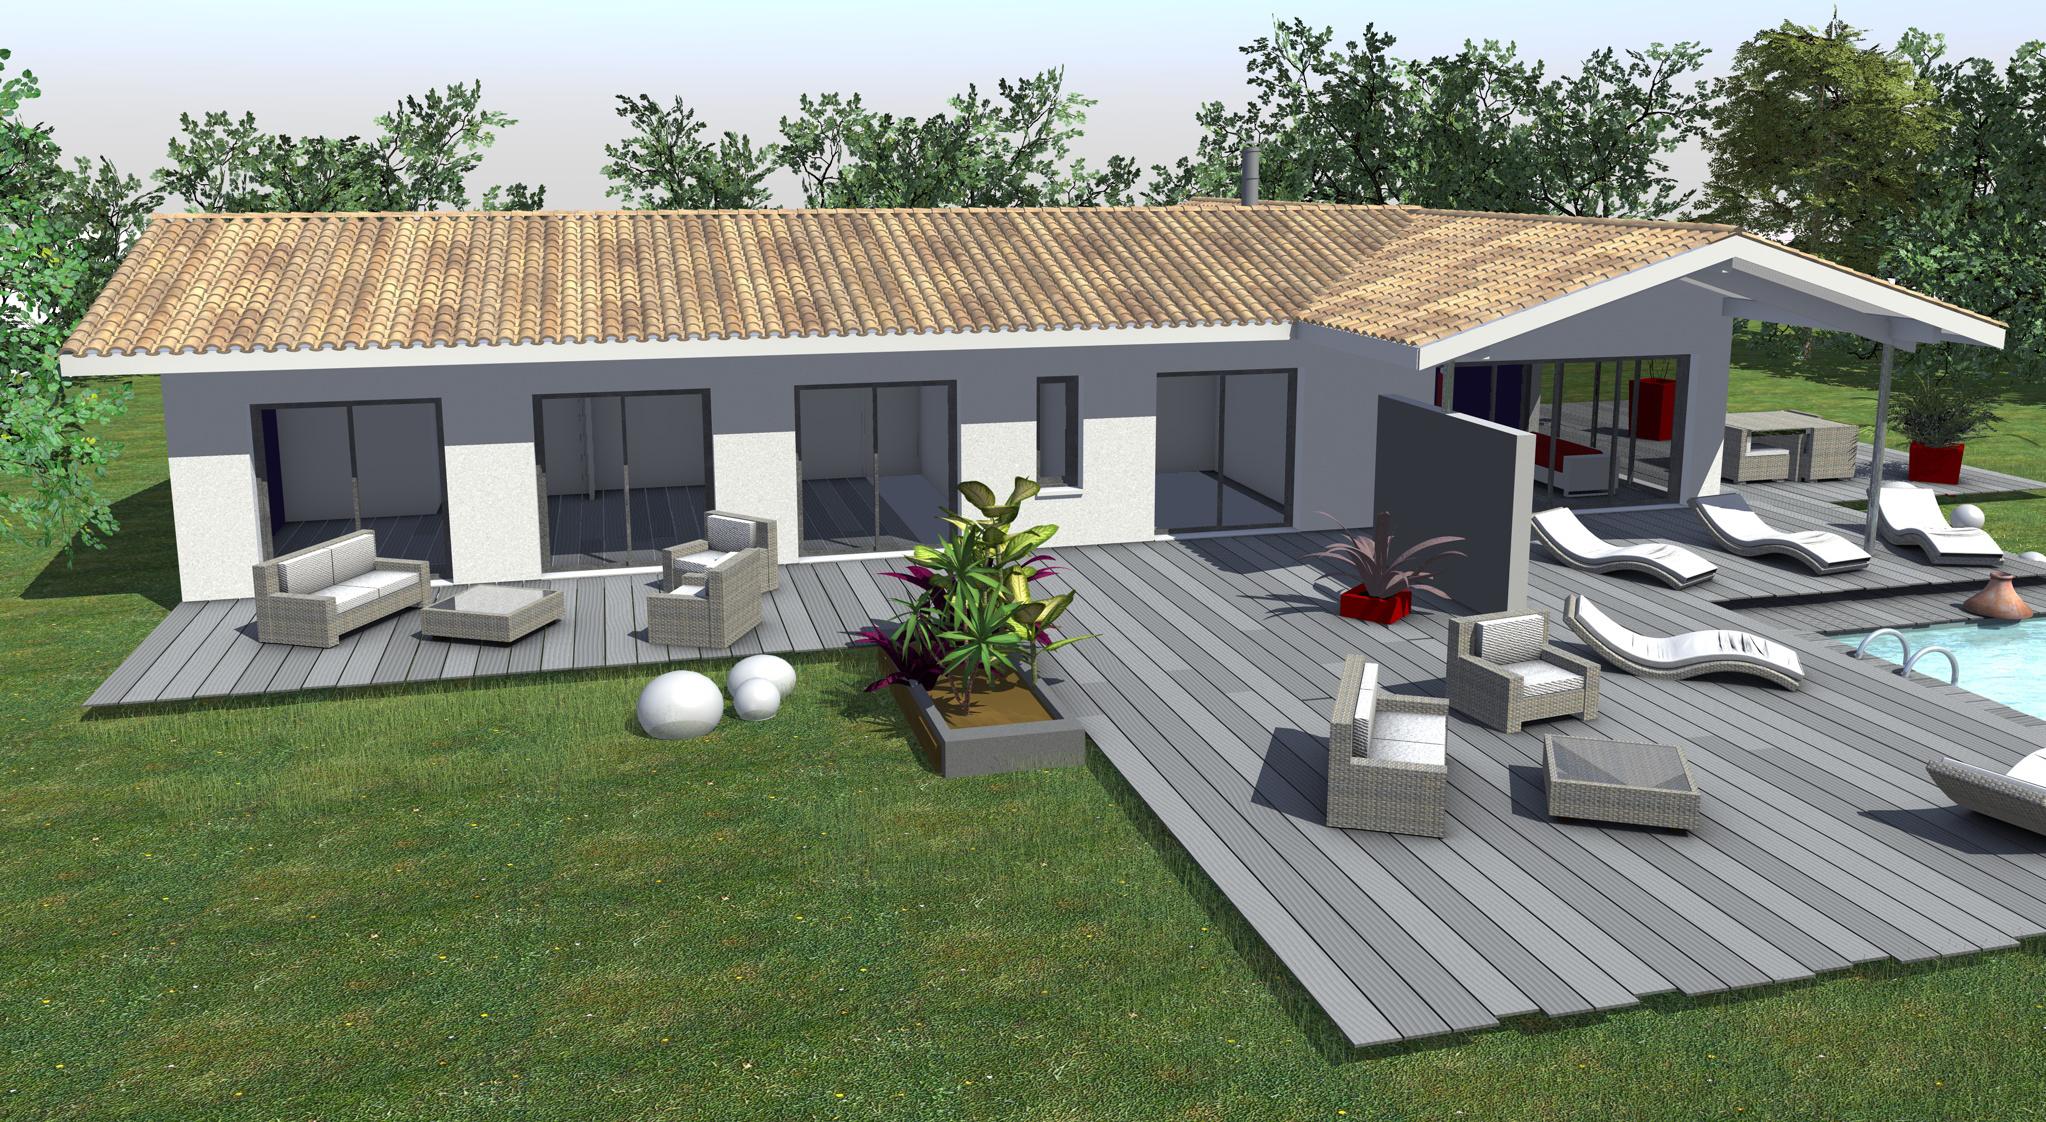 Deco Terrasse Maison Perfect Dco Terrasse Avec Bassin